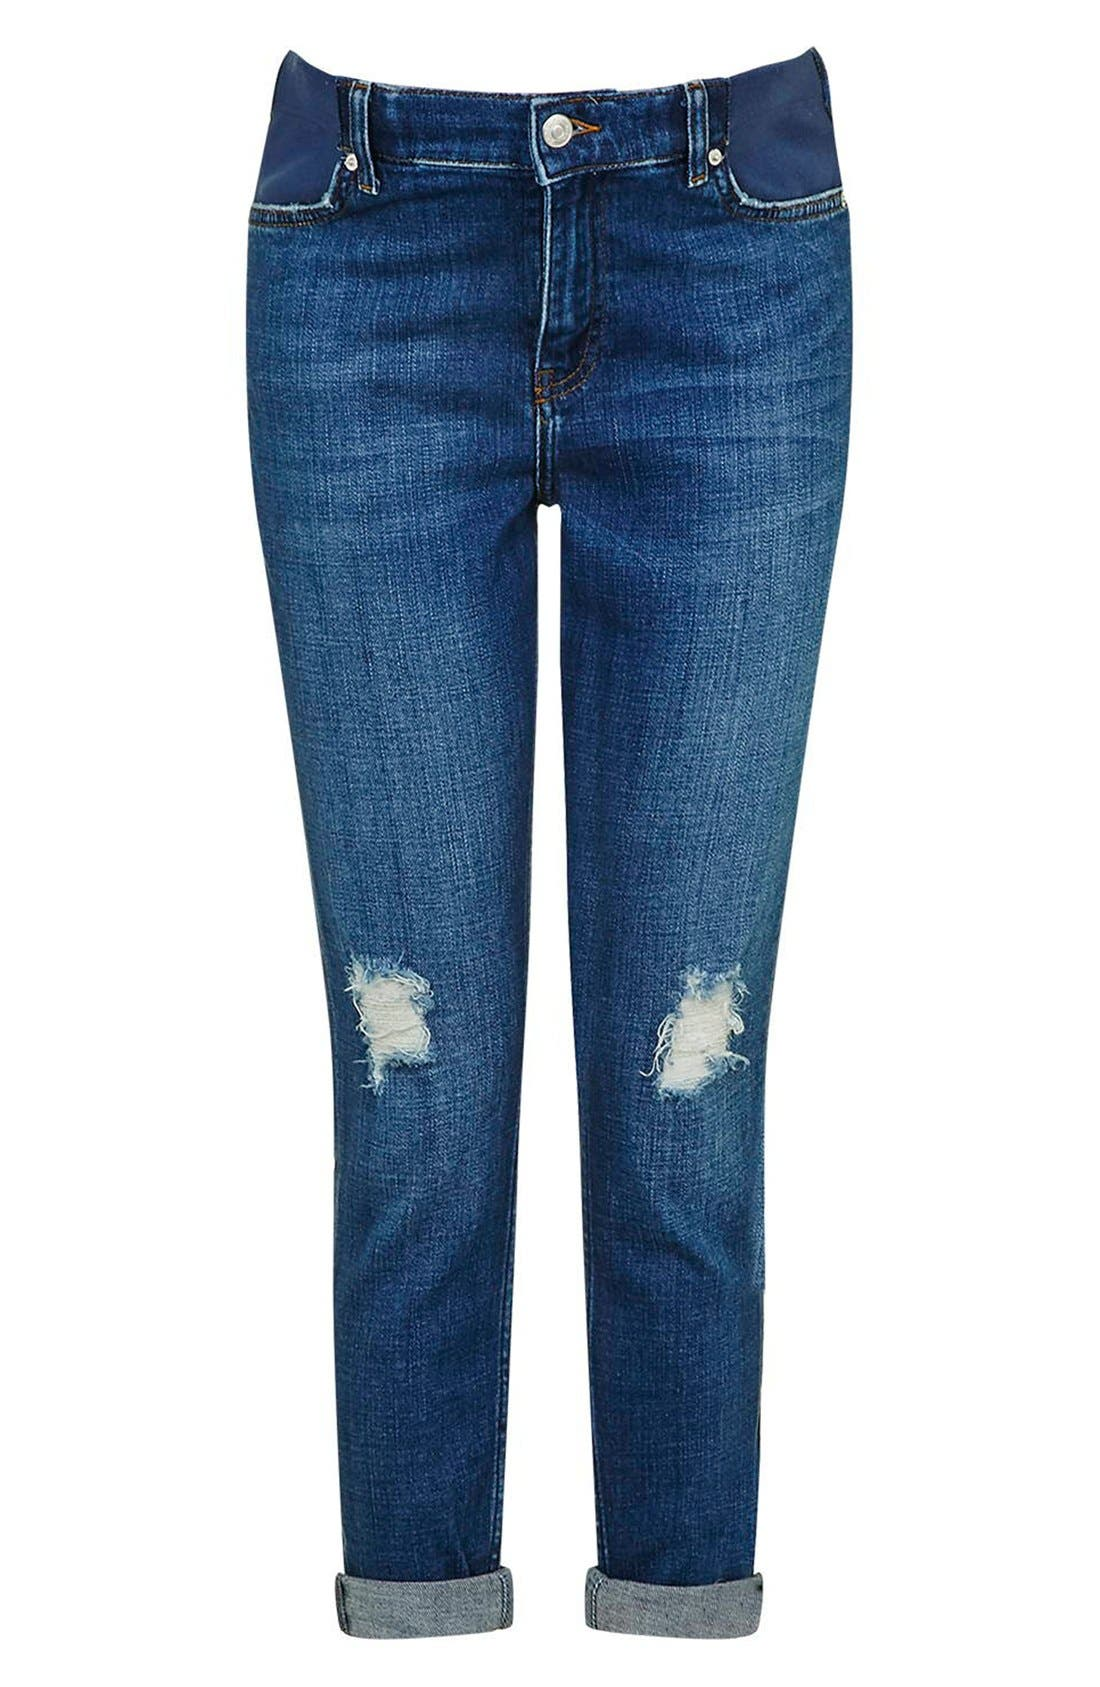 Alternate Image 1 Selected - Topshop Moto 'Lucas' Maternity Boyfriend Jeans